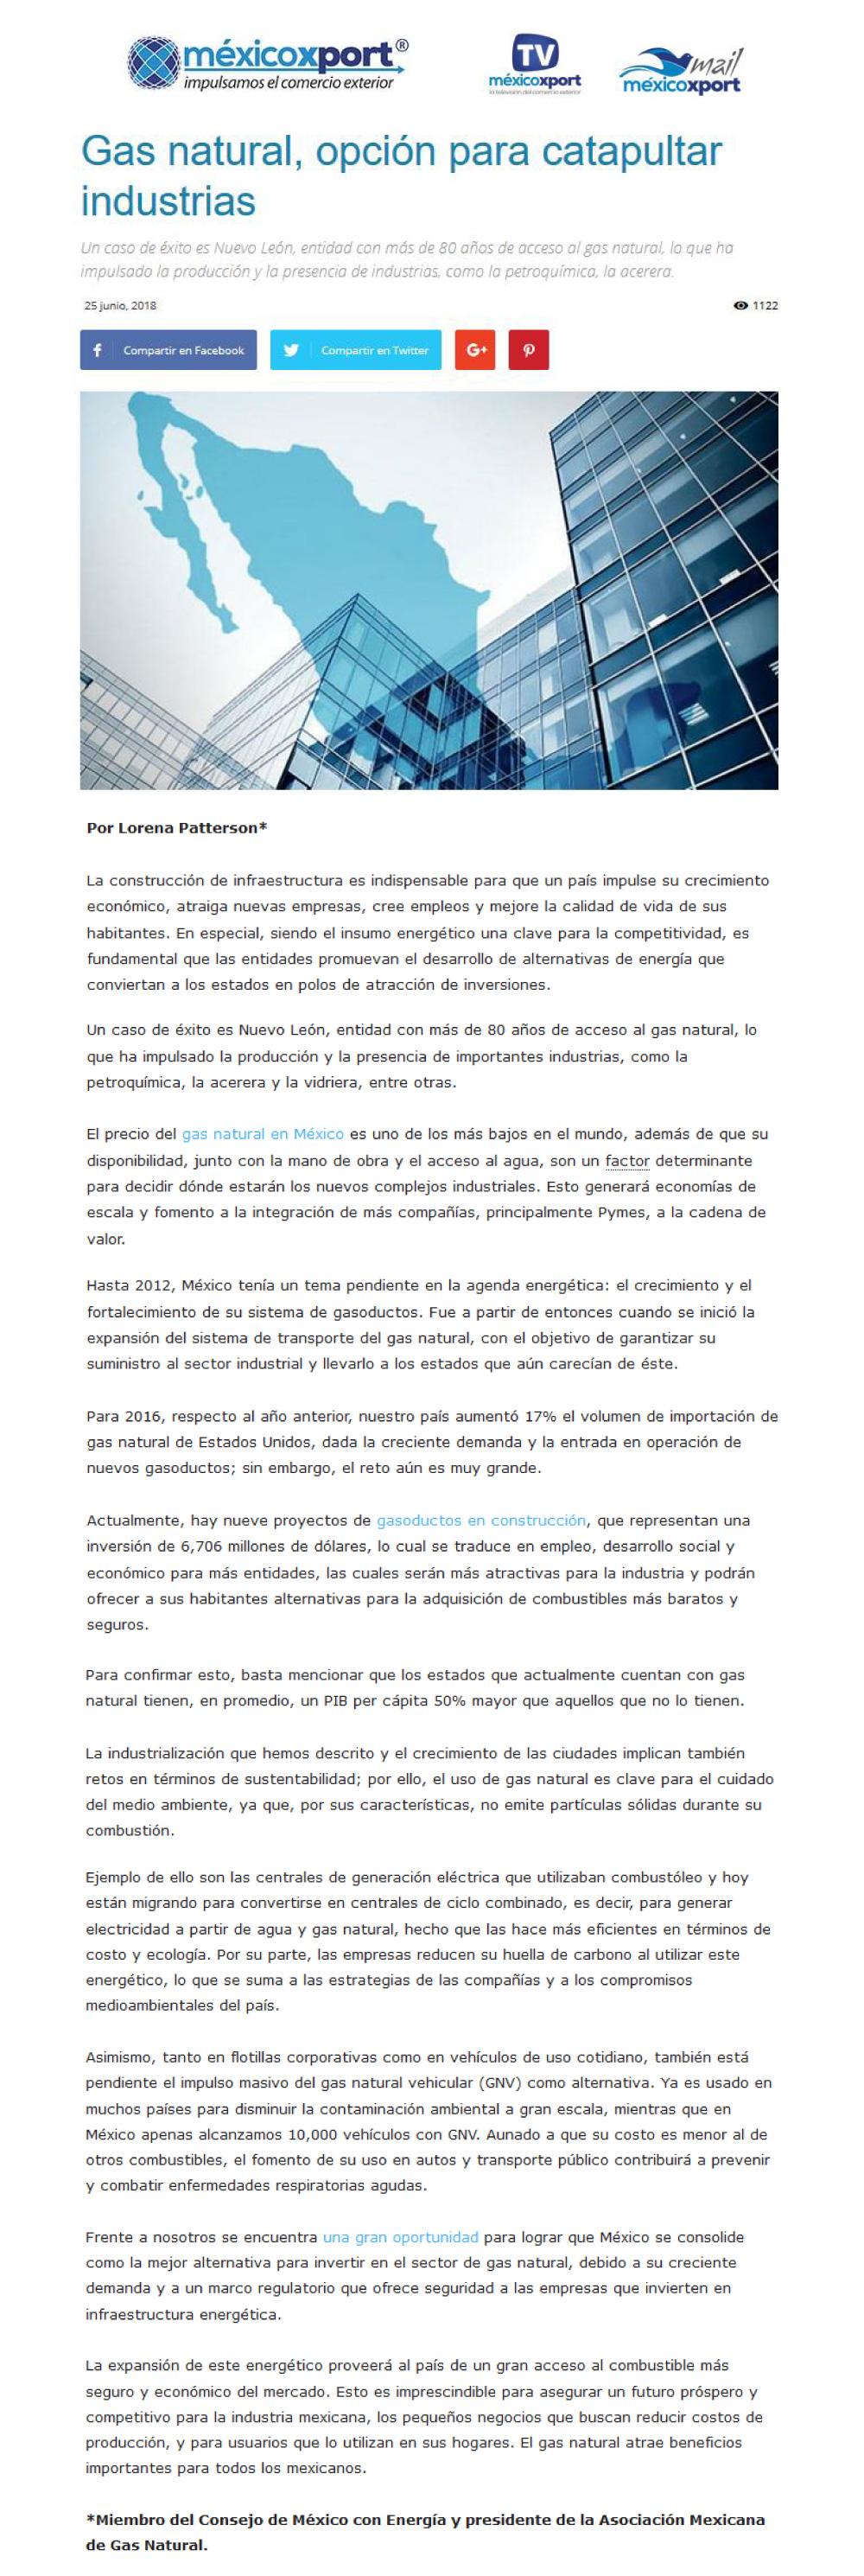 AMGN_Notas_20_Junio